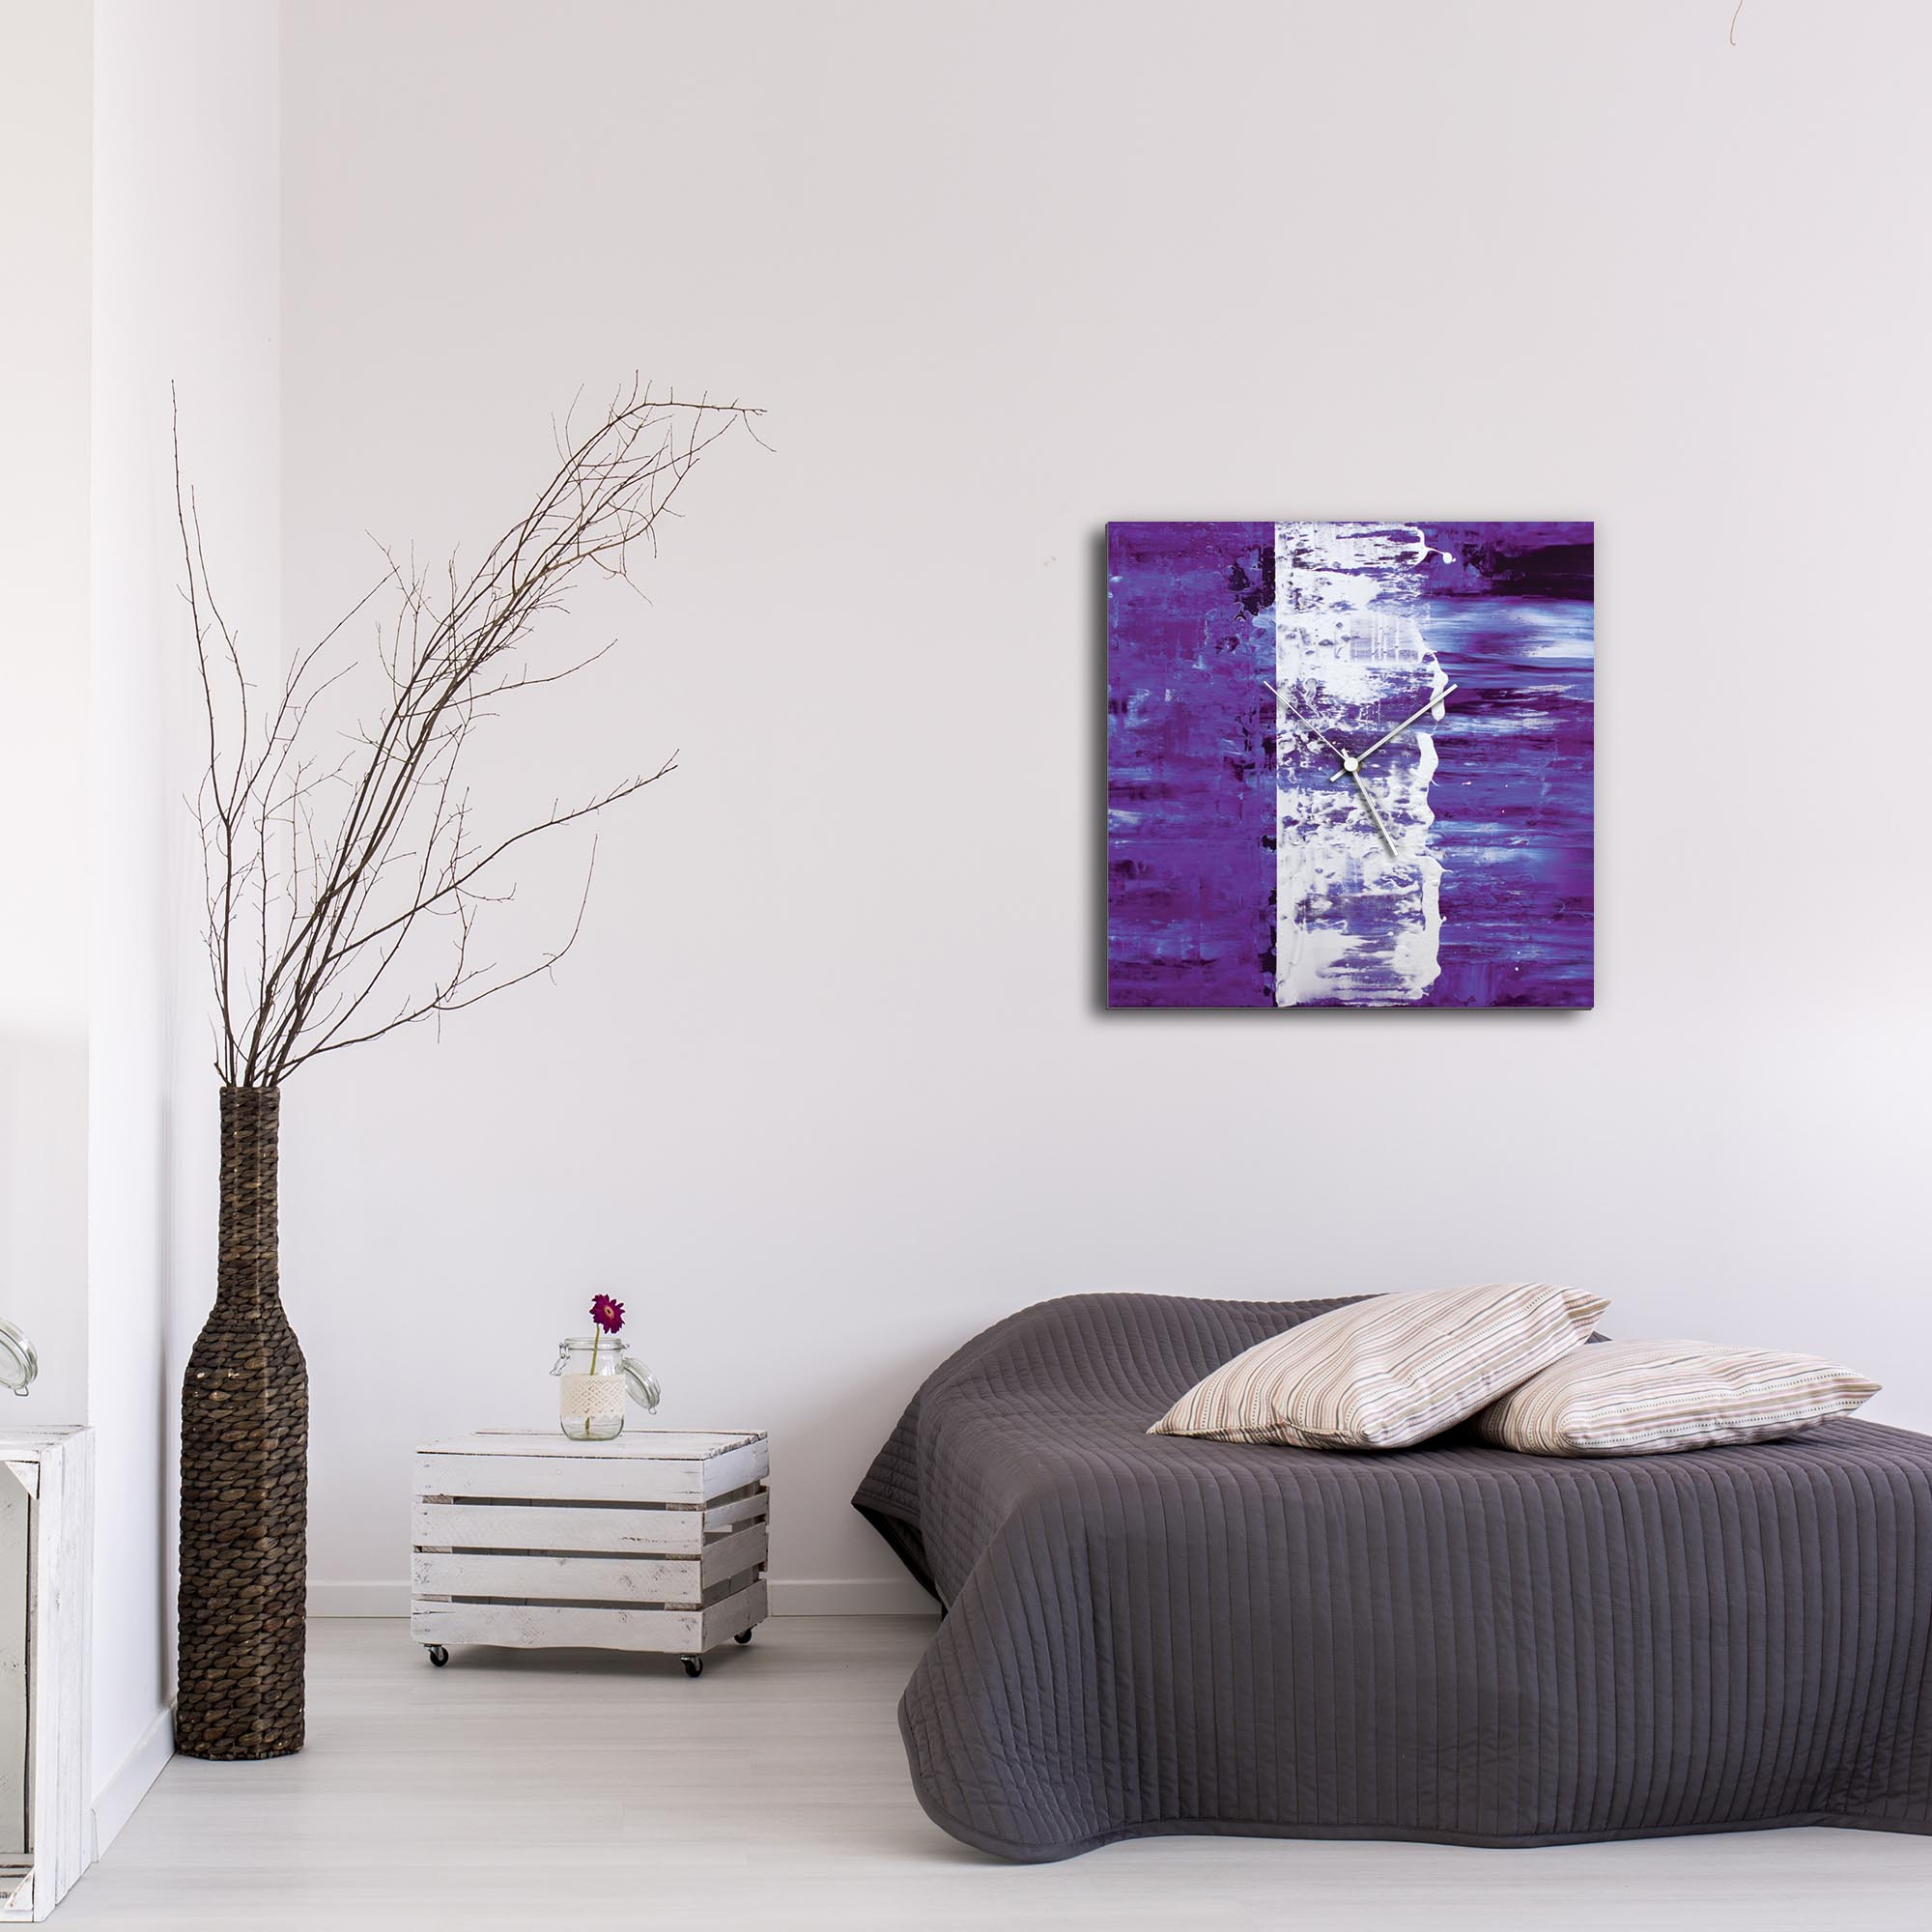 Purple Street Square Clock Large by Mendo Vasilevski - Urban Abstract Home Decor - Lifestyle View